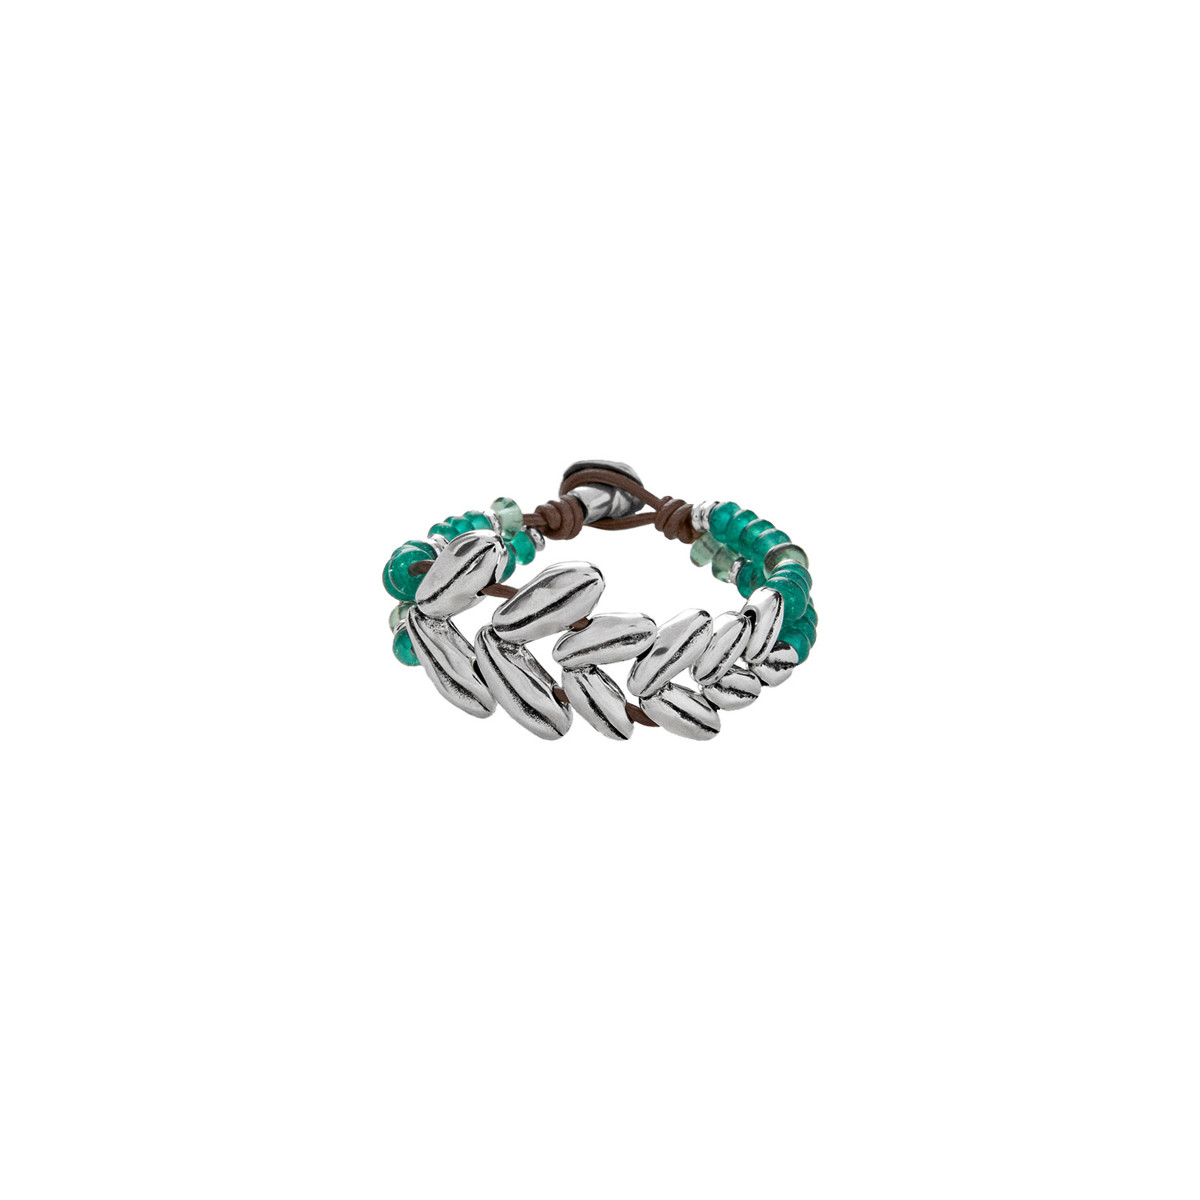 UNOde50 ESPIGA Bracelet (large view)